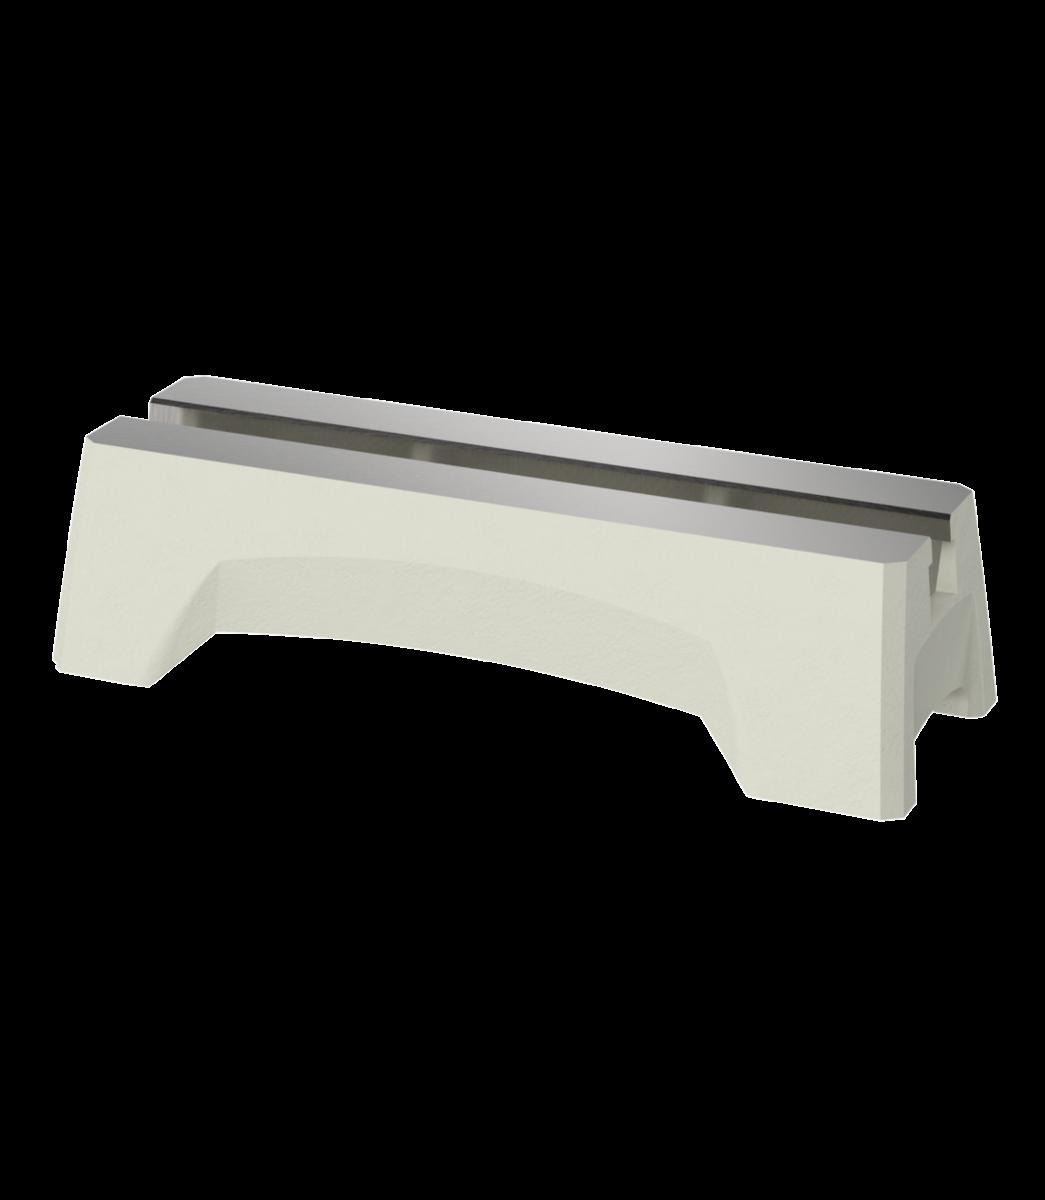 Bed Extension for Jet JWL-20EXT Lathe